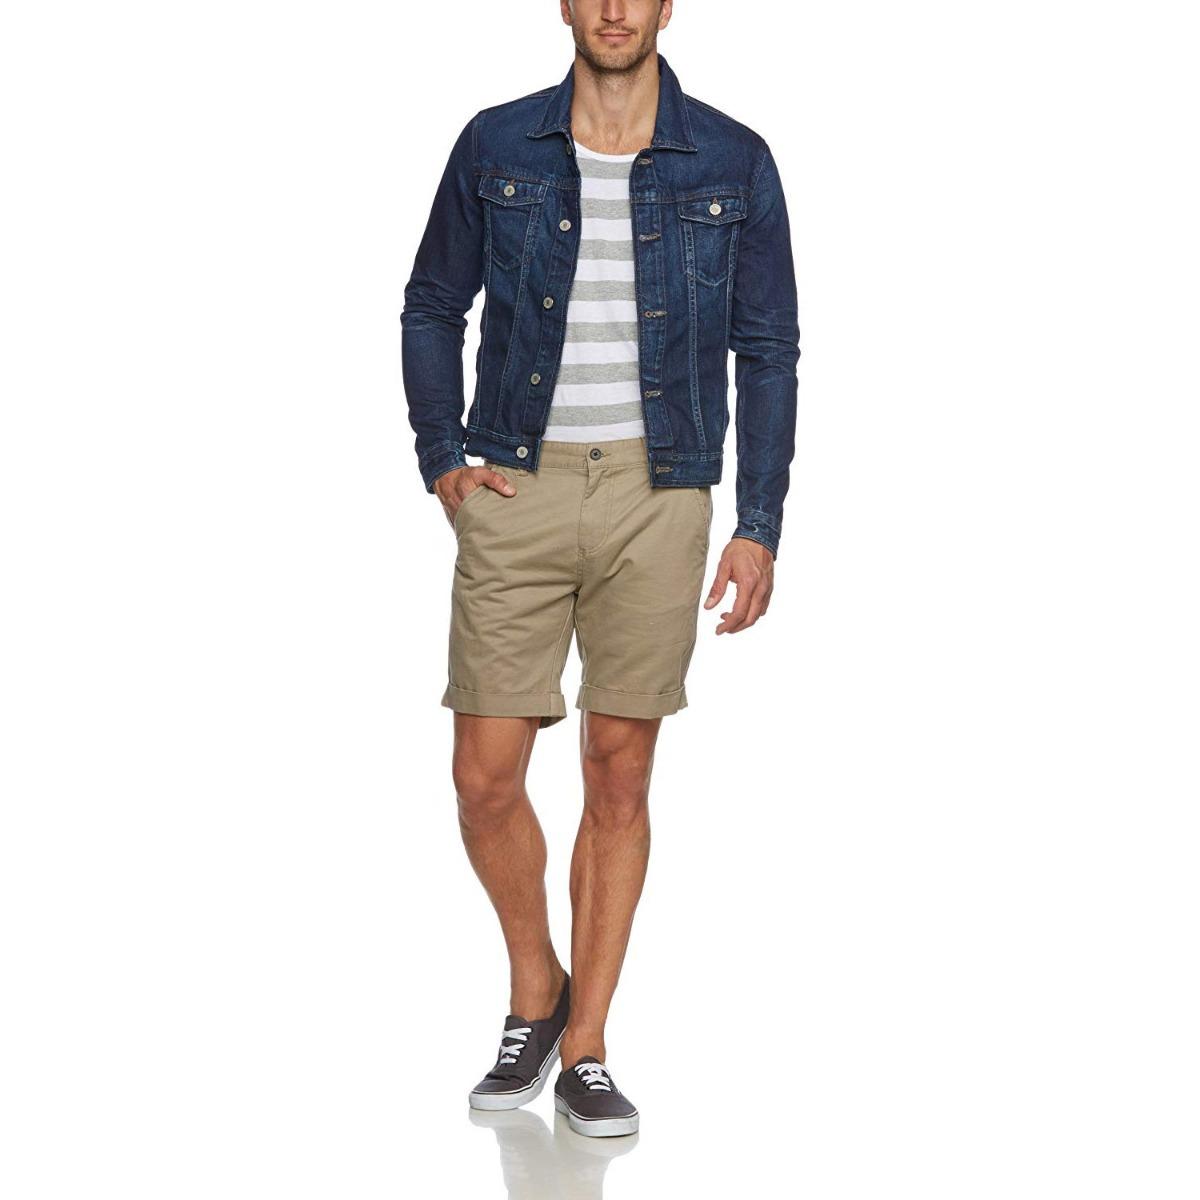 Jack /& Jones Denim Jacket Mens Long Sleeve Jean JJVC RRP £60